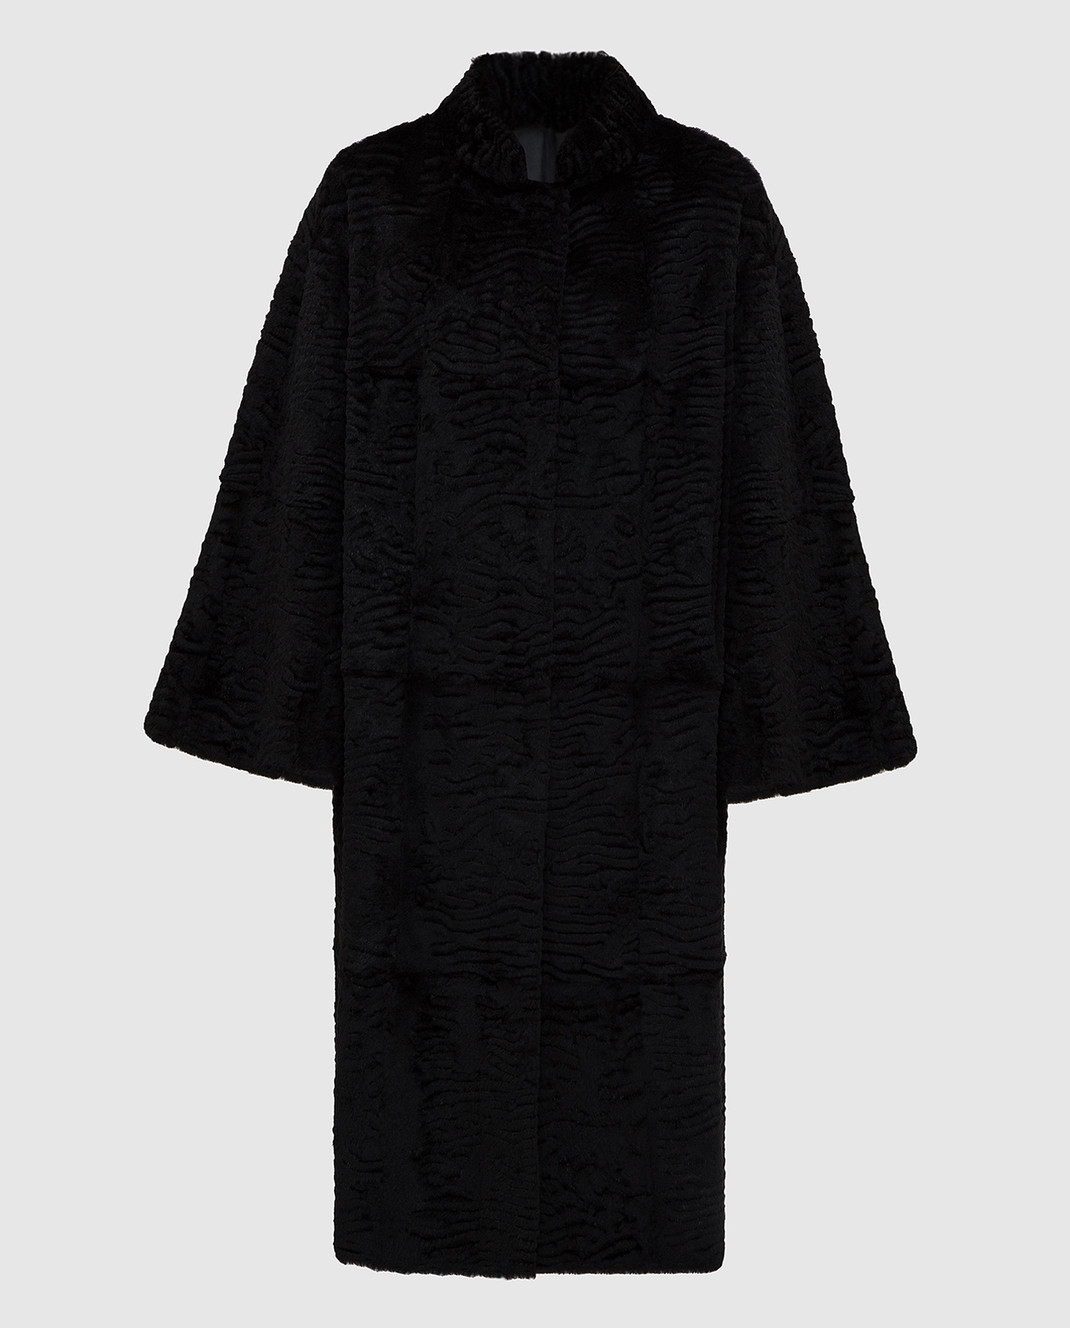 Giuliana Teso Черное пальто из меха кролика 84KA440A